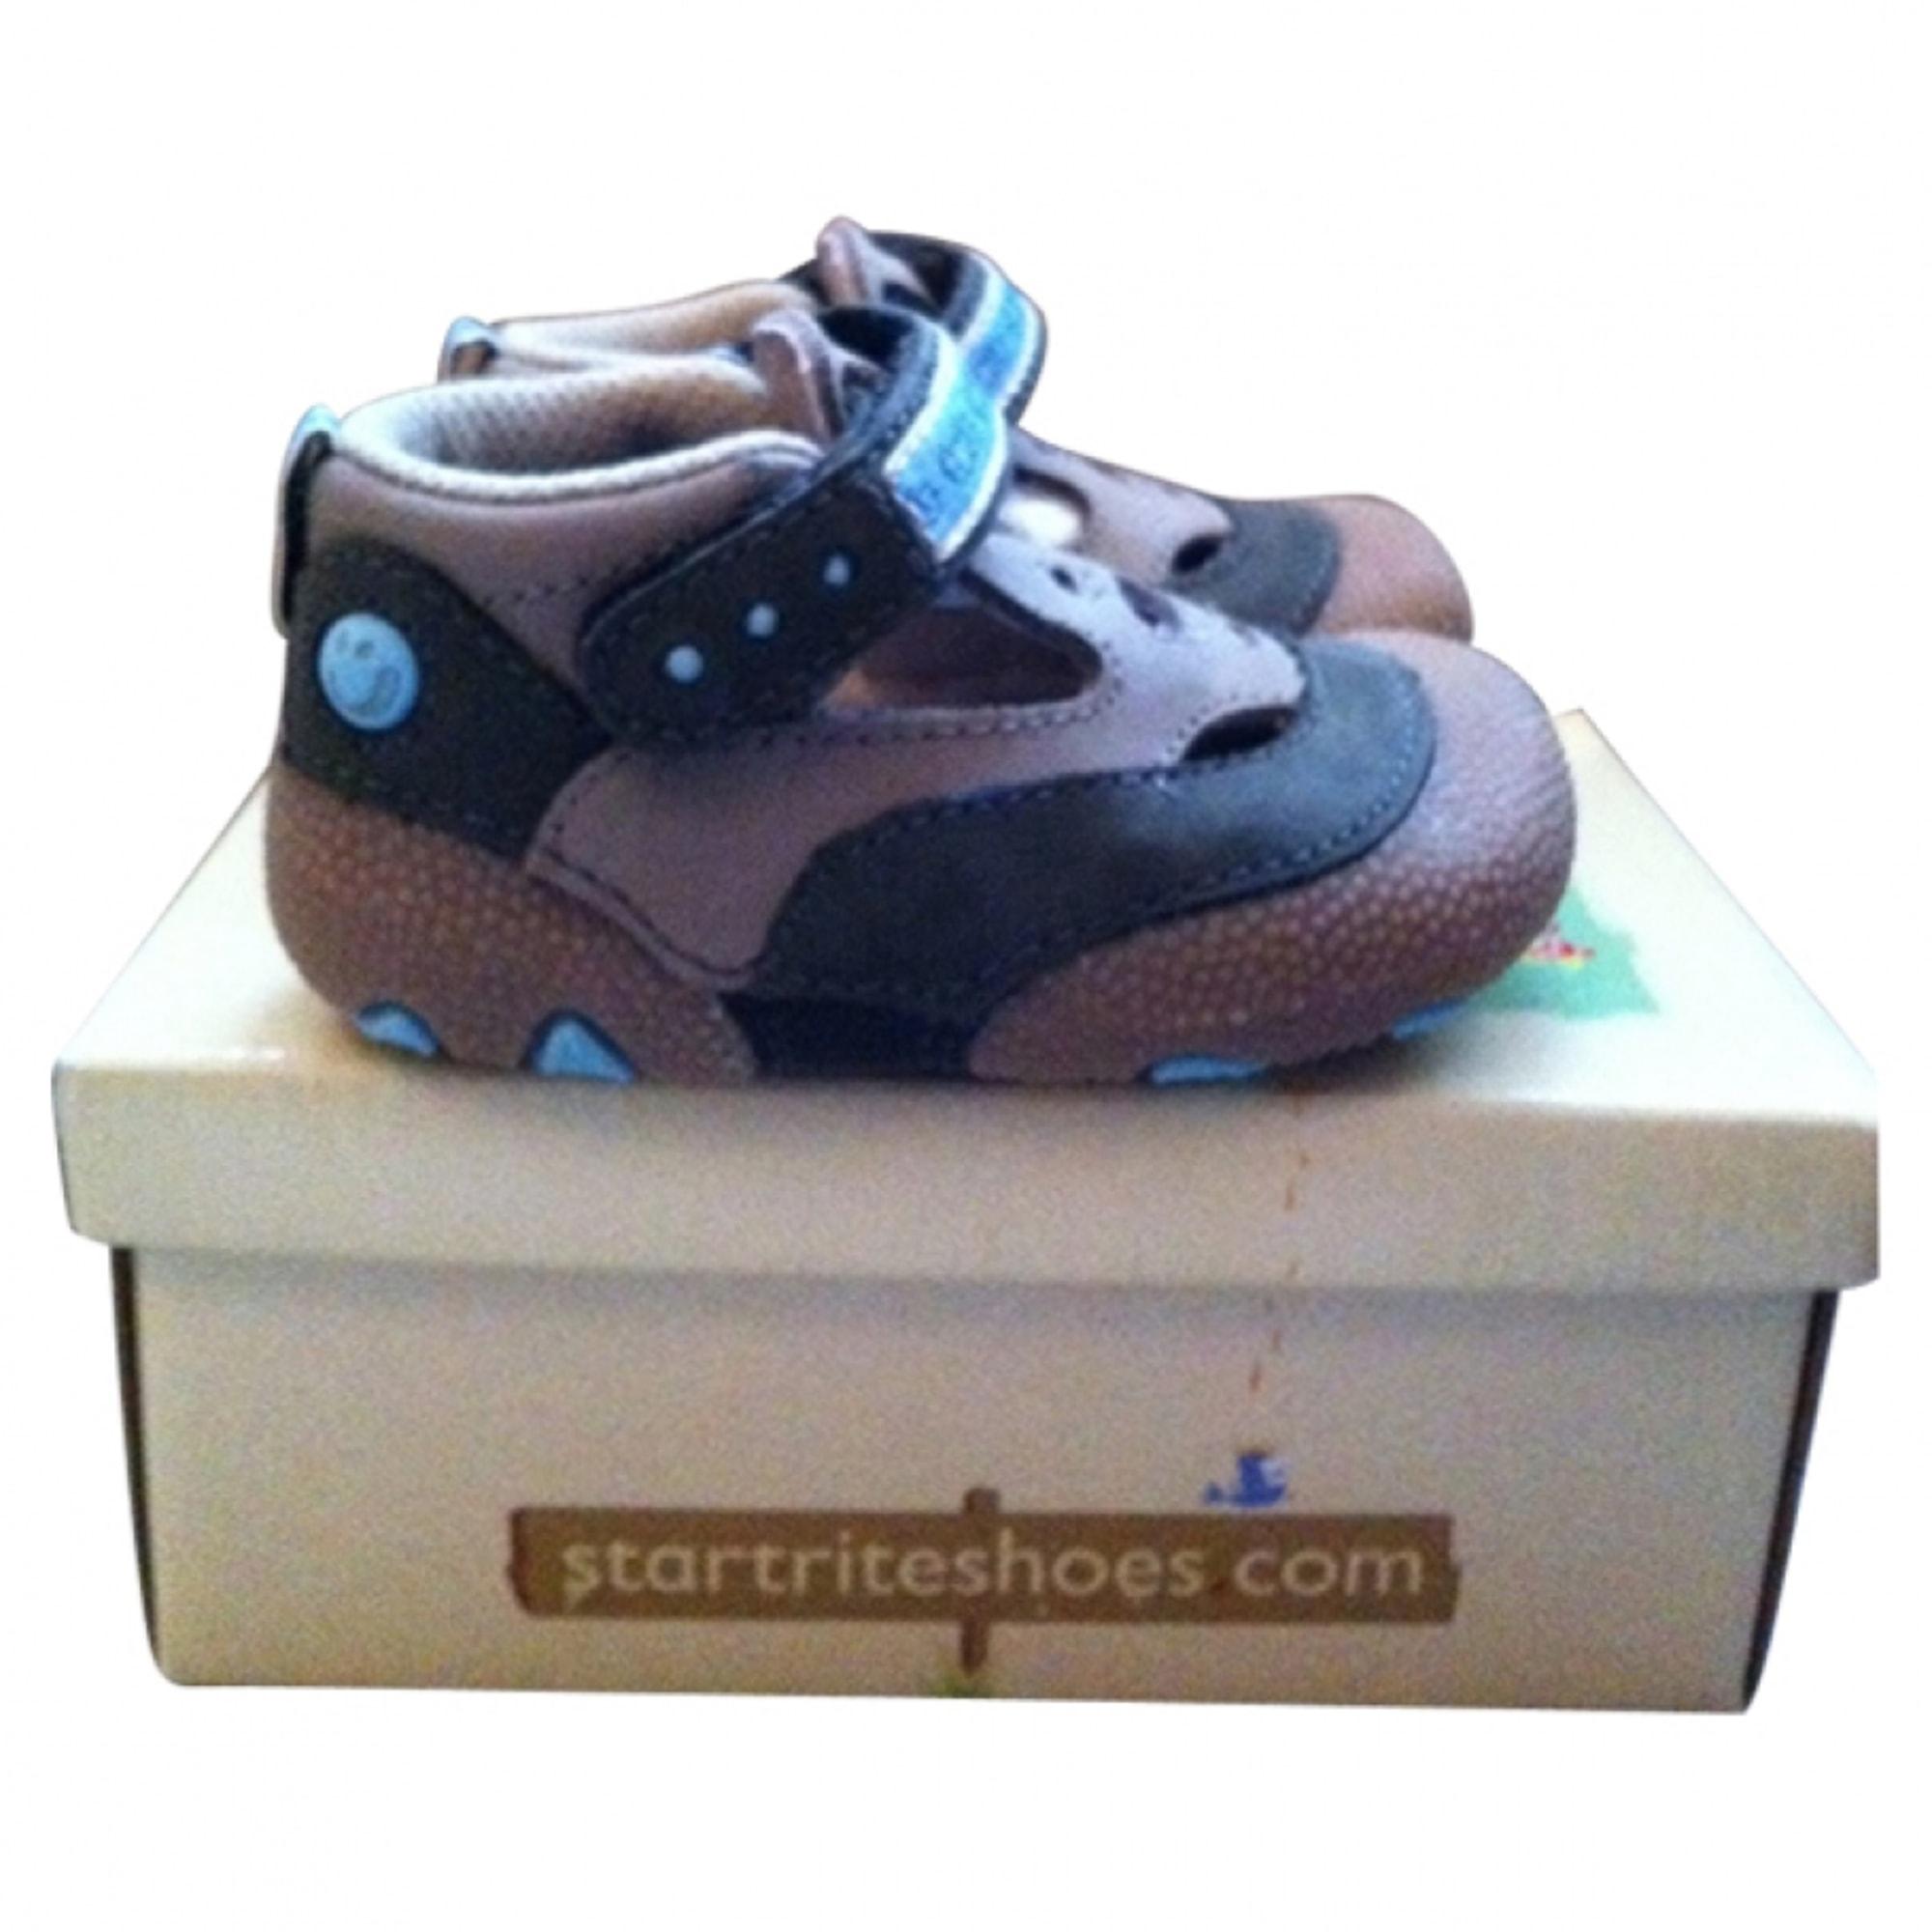 Velcro Shoes START RITE Multicolor